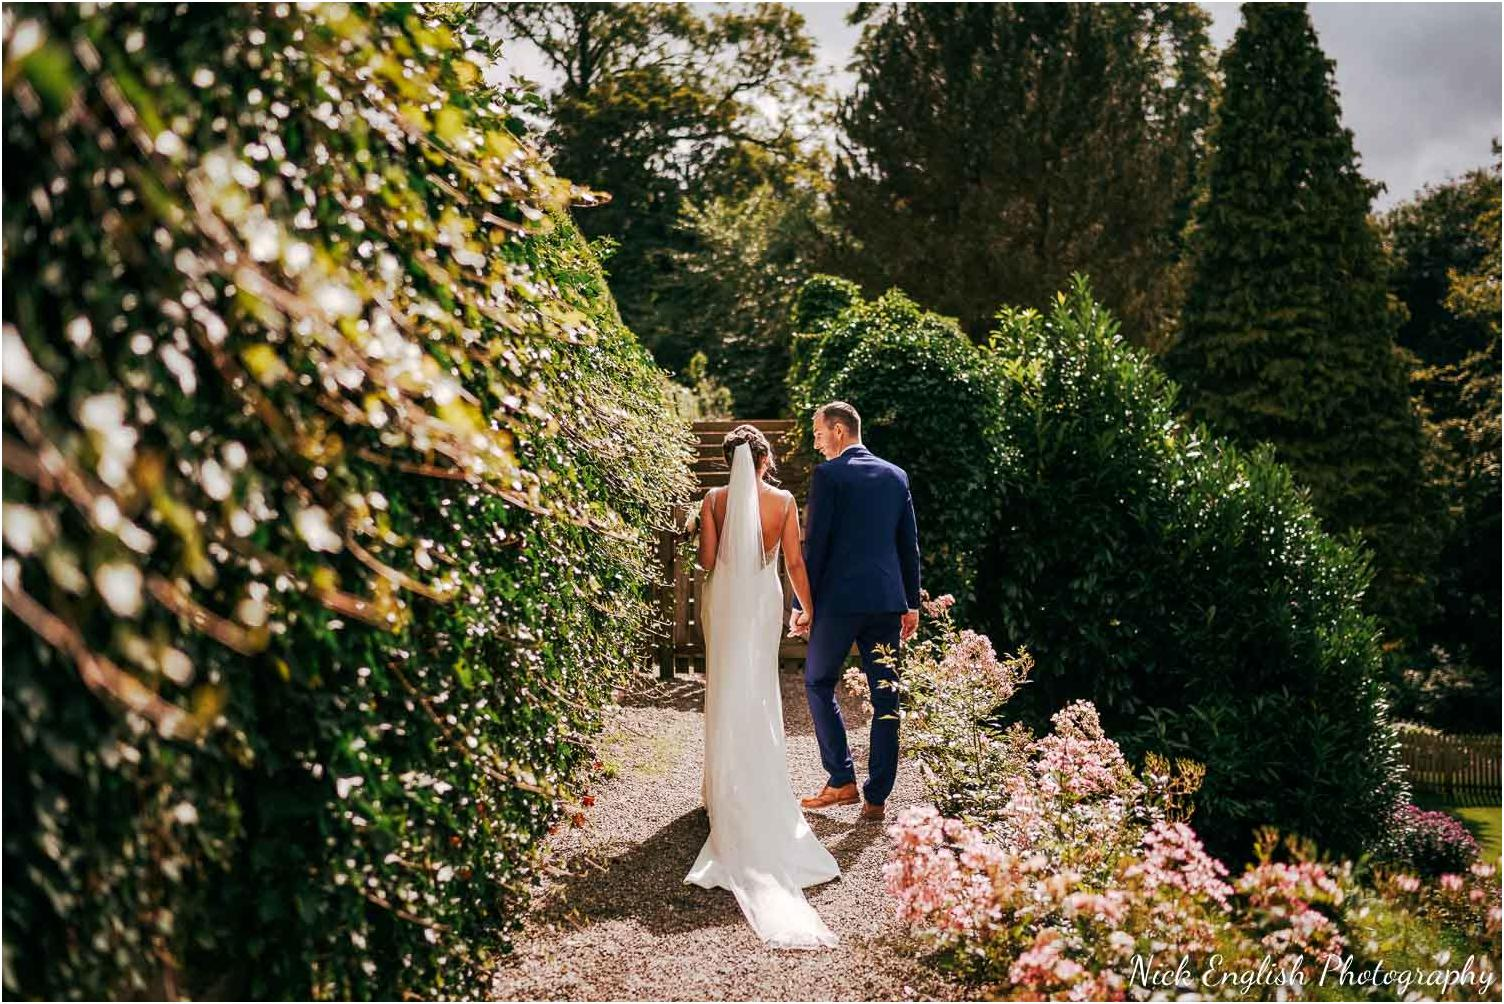 Mitton_Hall_Wedding_Summer_Photograph-84.jpg